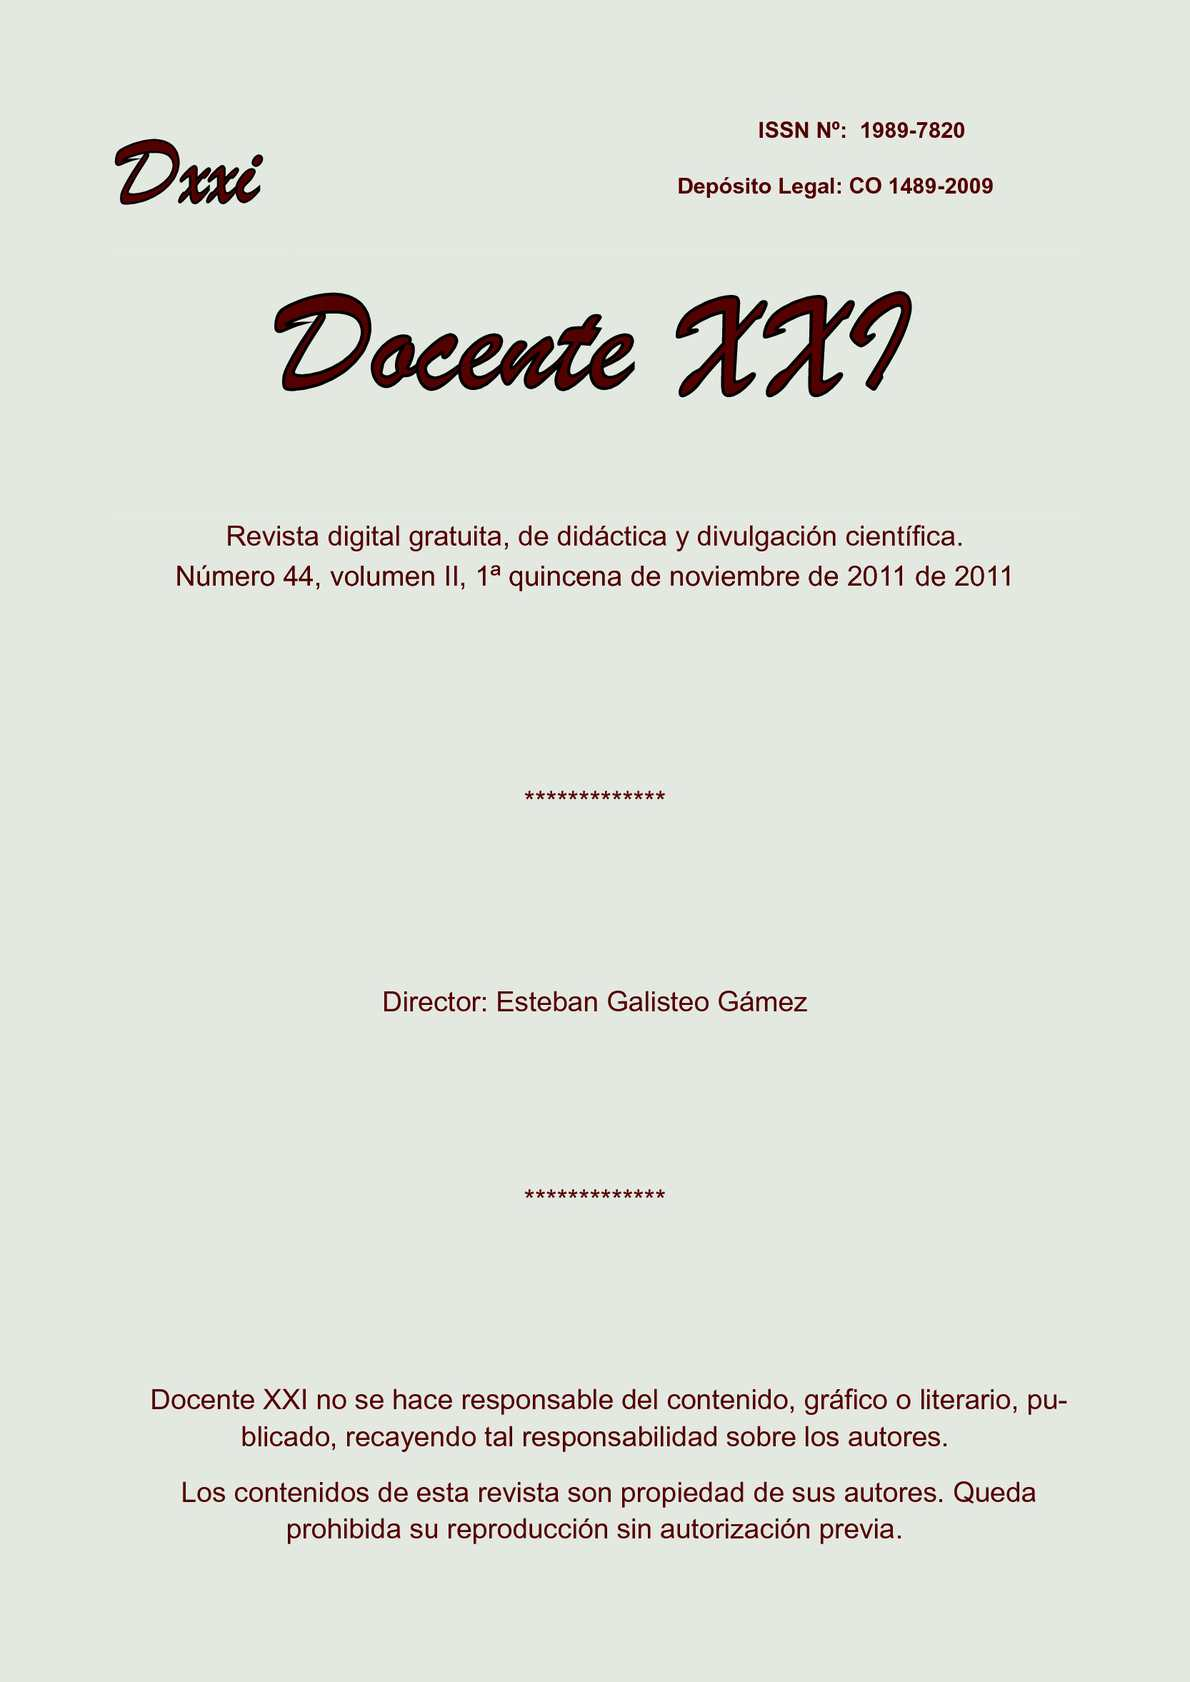 Calaméo - Docente XXI Nº 44, Vol. II, 1ª quincena de noviembre de 2011